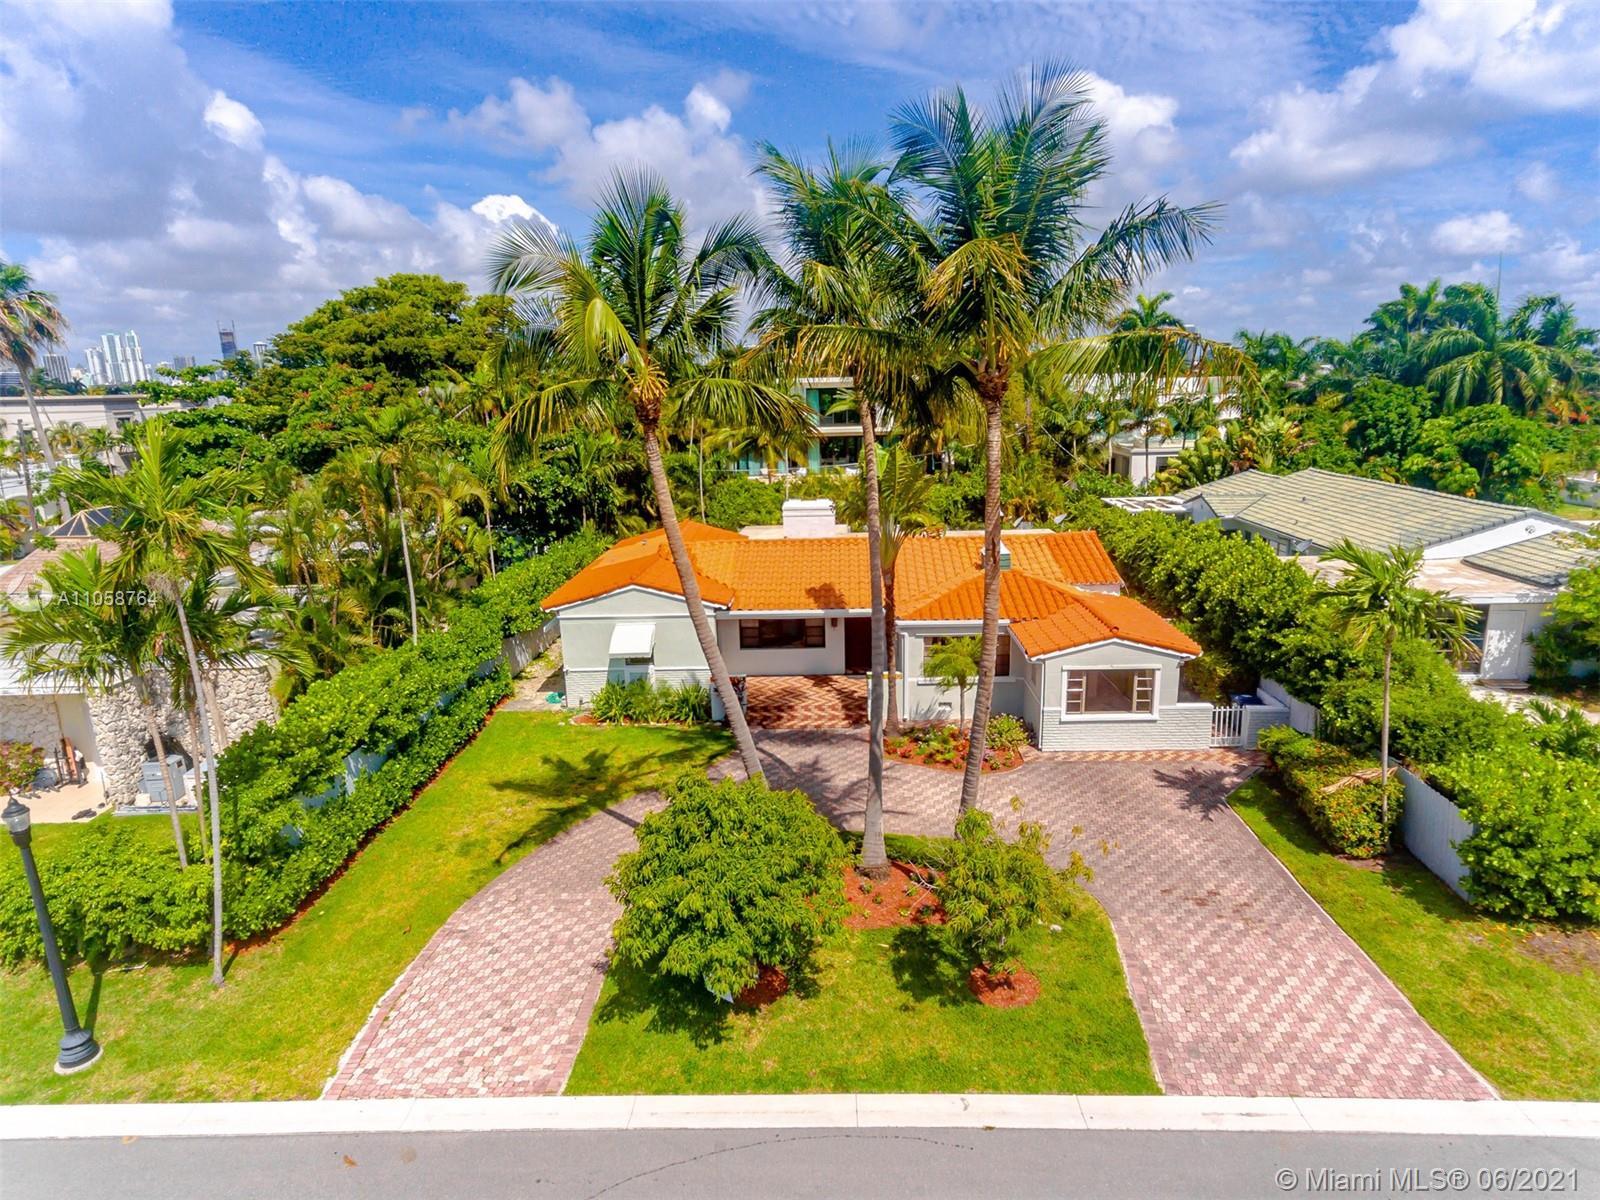 Hibiscus Island - 118 E 3rd Ct, Miami Beach, FL 33139